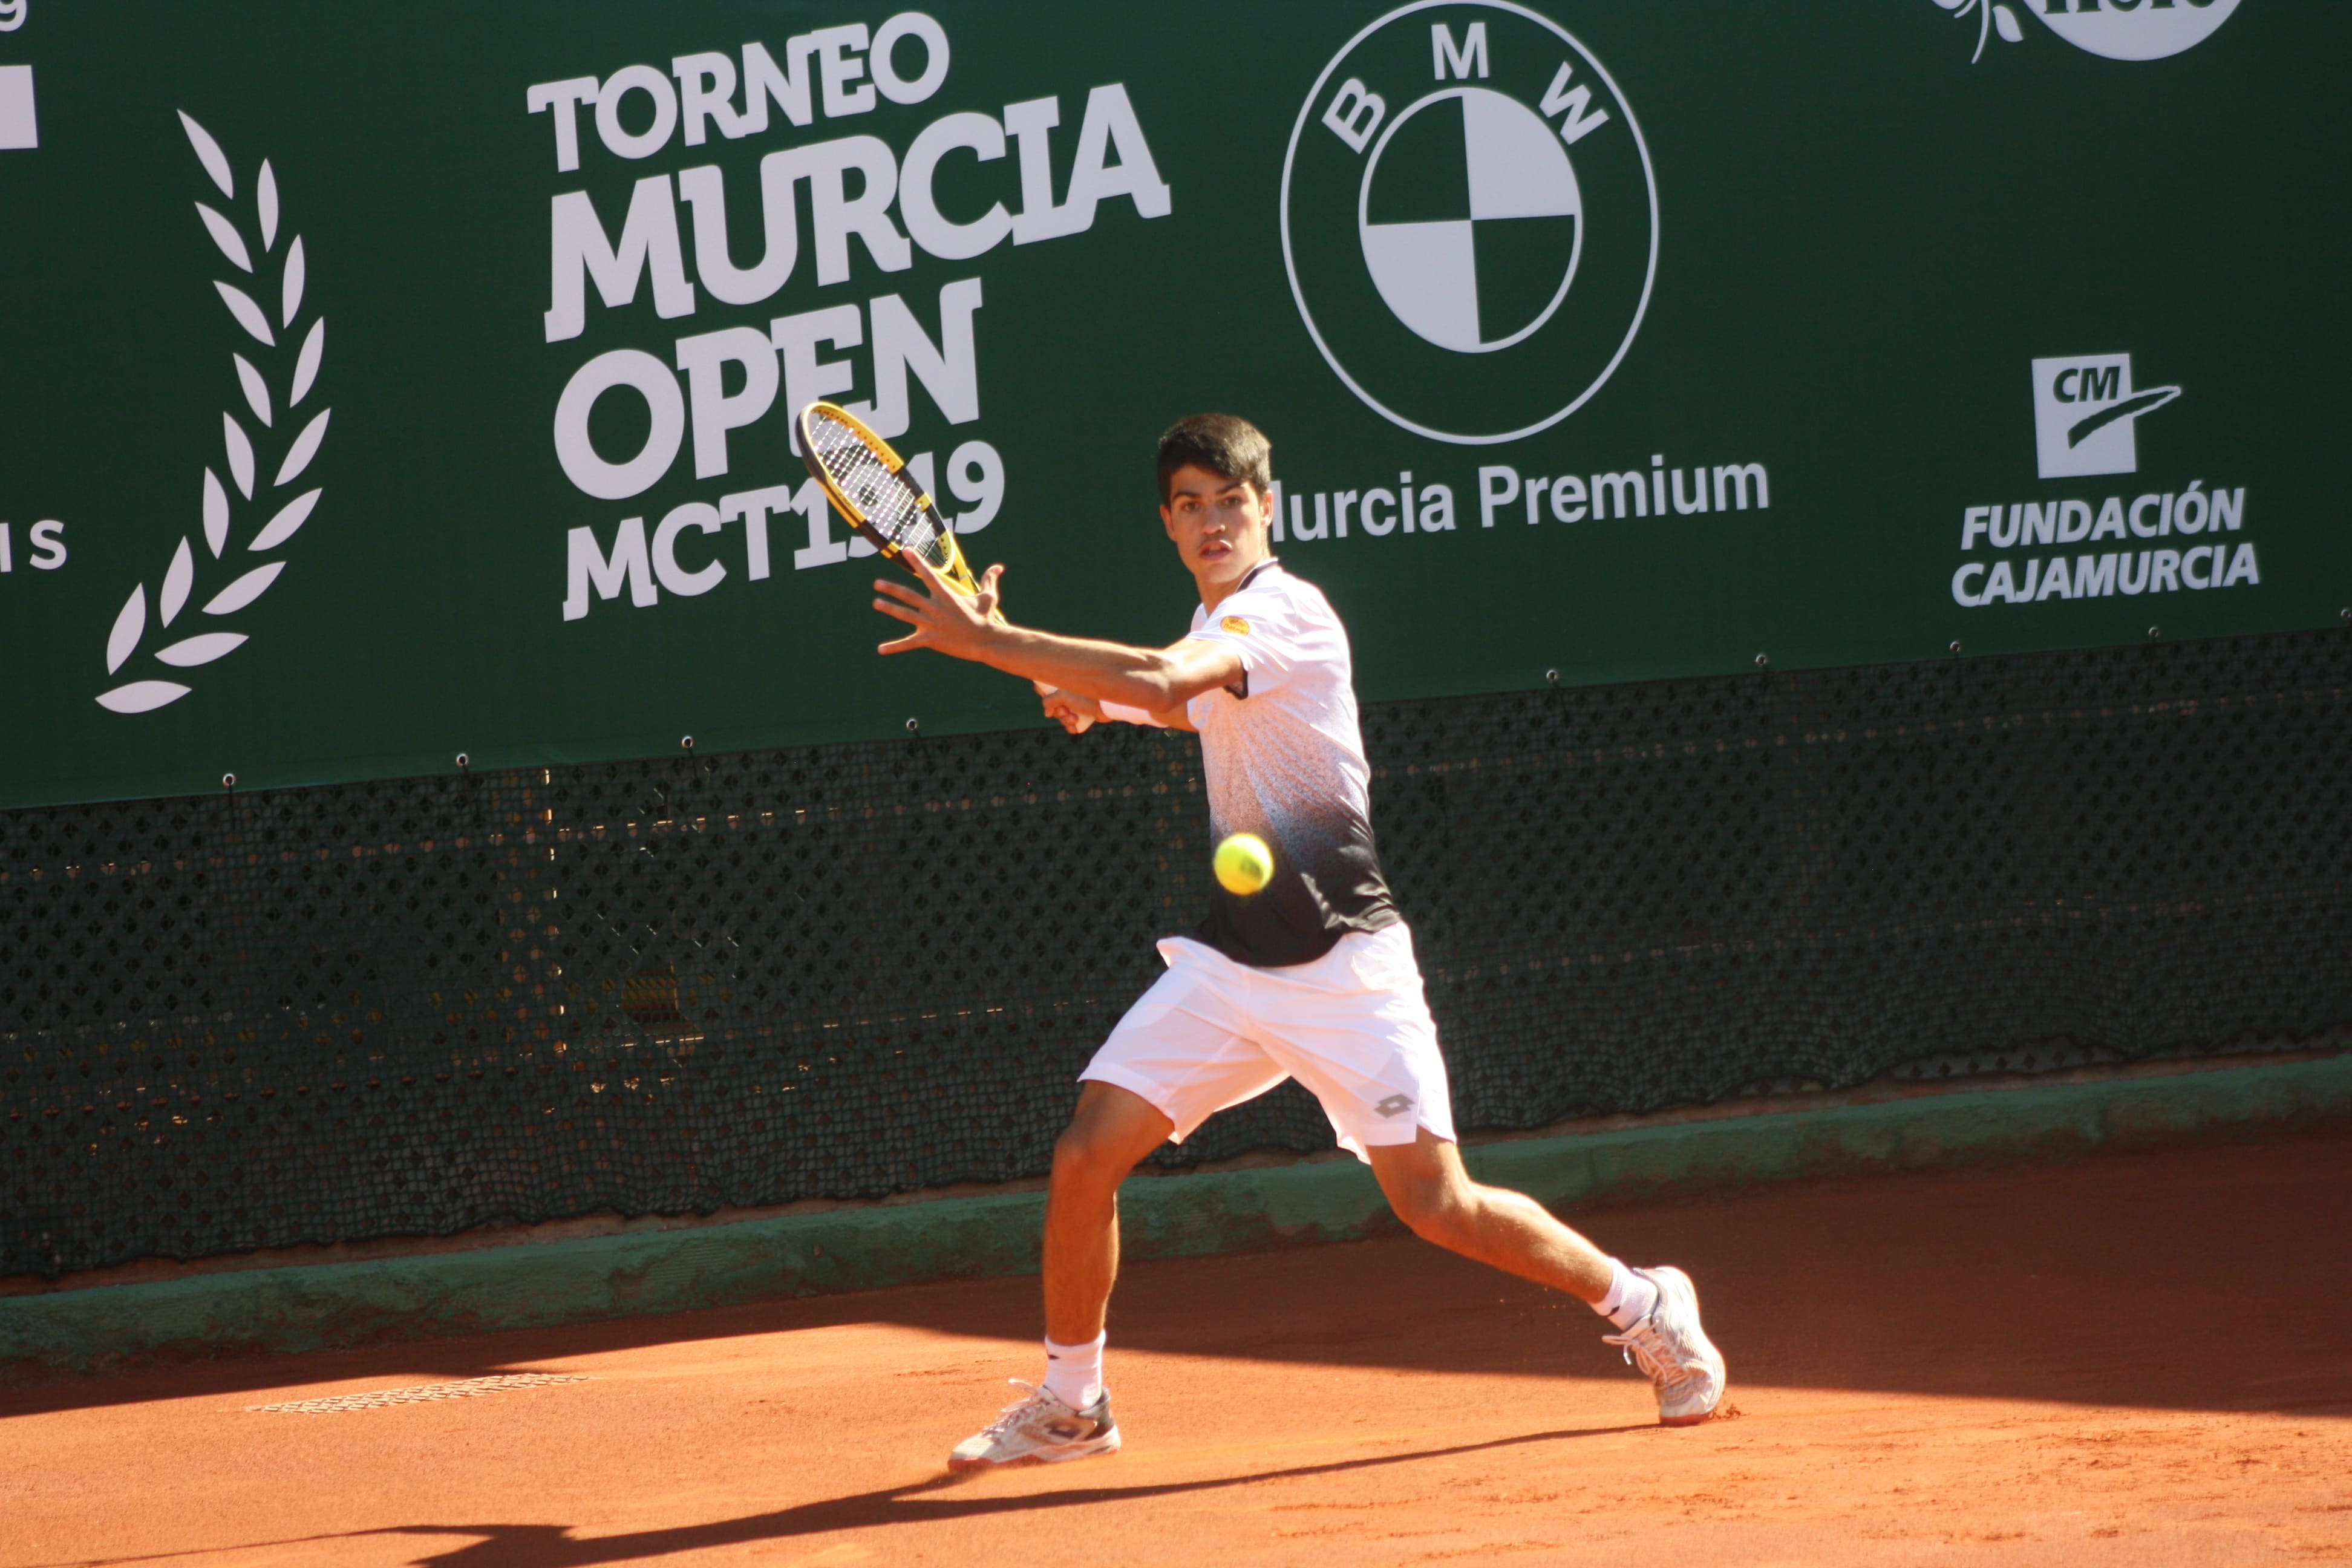 Carlos Alcaraz fue una de las grandes sensaciones en el I Murcia Open MCT 1919 (Foto: Andrés Molina).